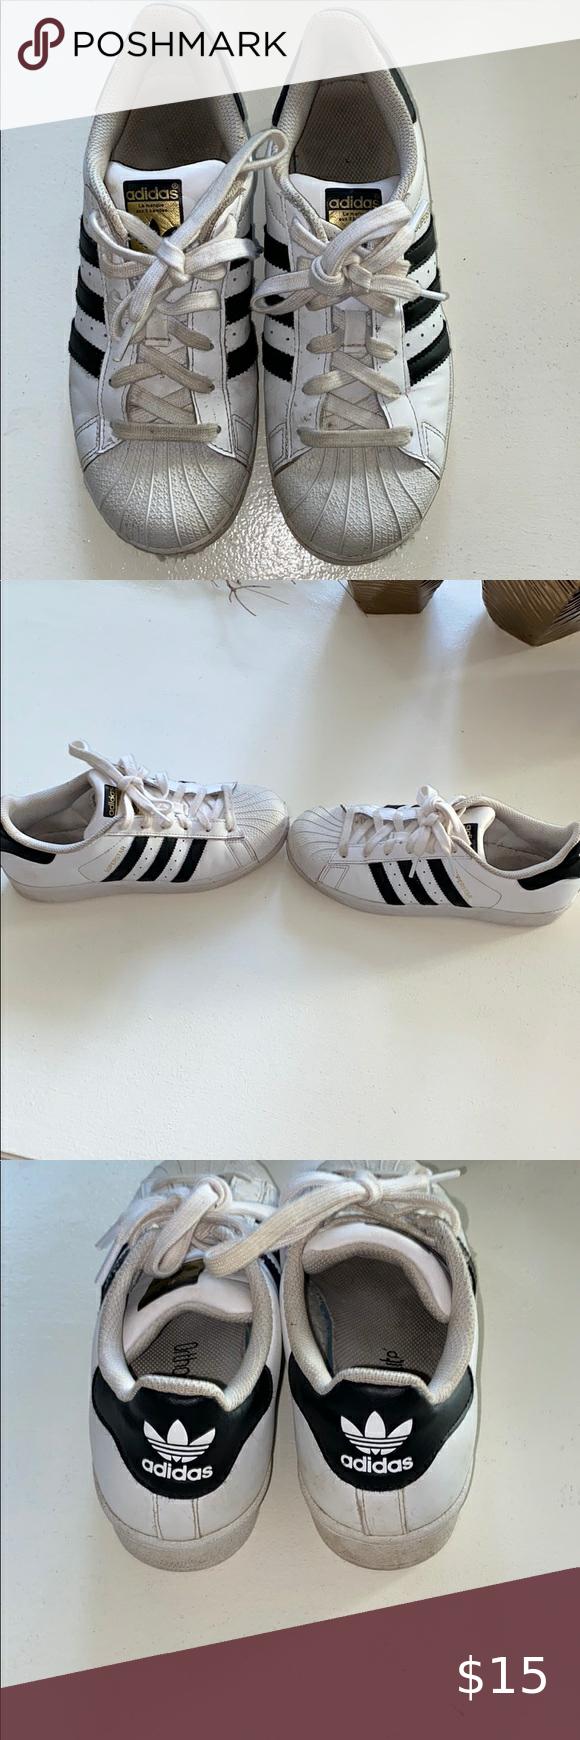 Adidas Superstar men's size 5.5   Adidas superstar mens, Shoe ...